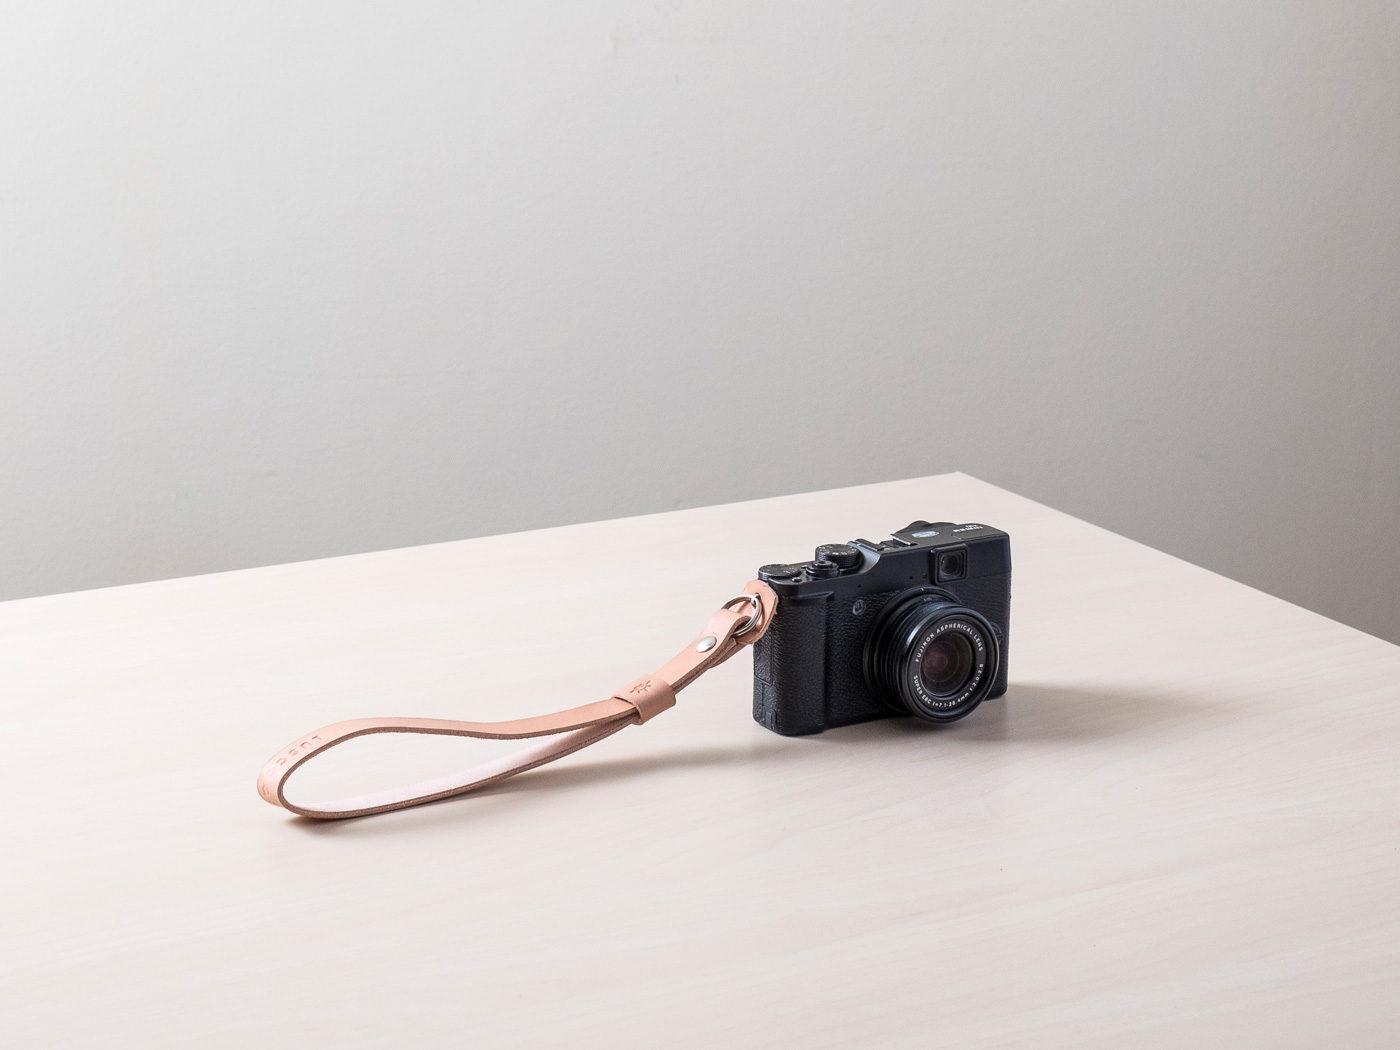 Correa de cuero para cámara de fotos Orballo Natural